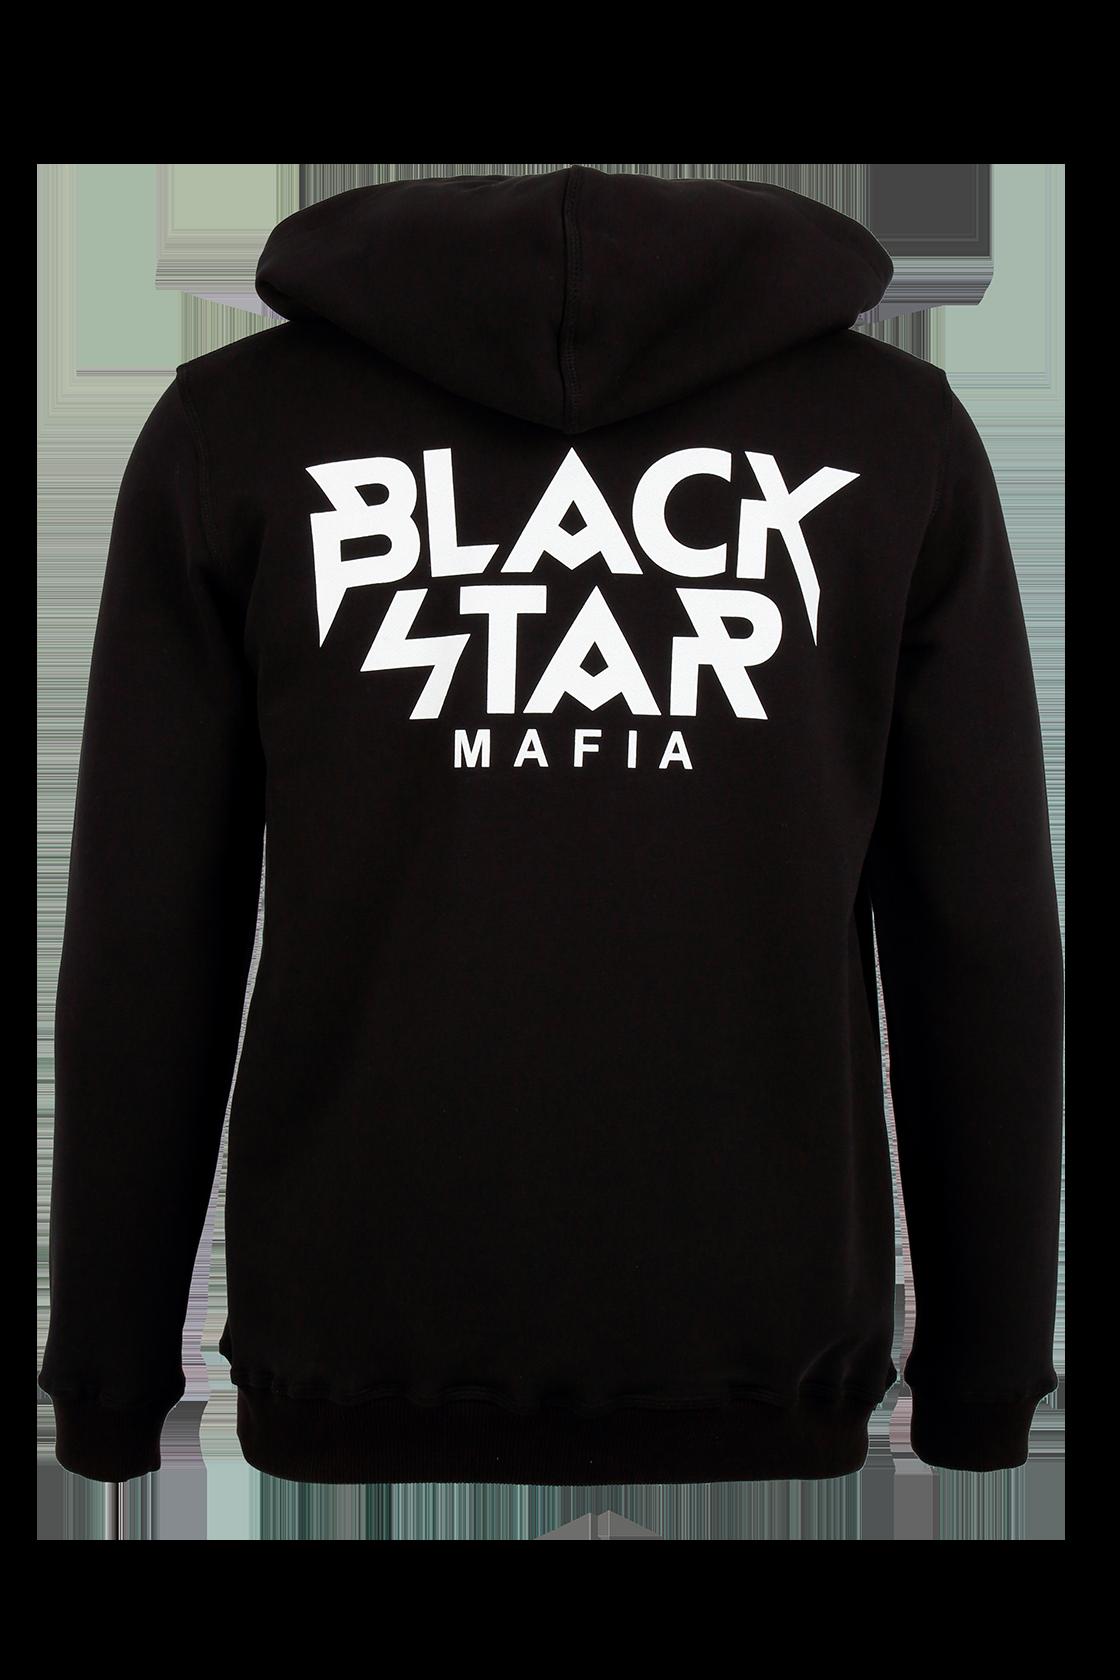 Толстовка унисекс Black Star Mafia Vintage от Black Star